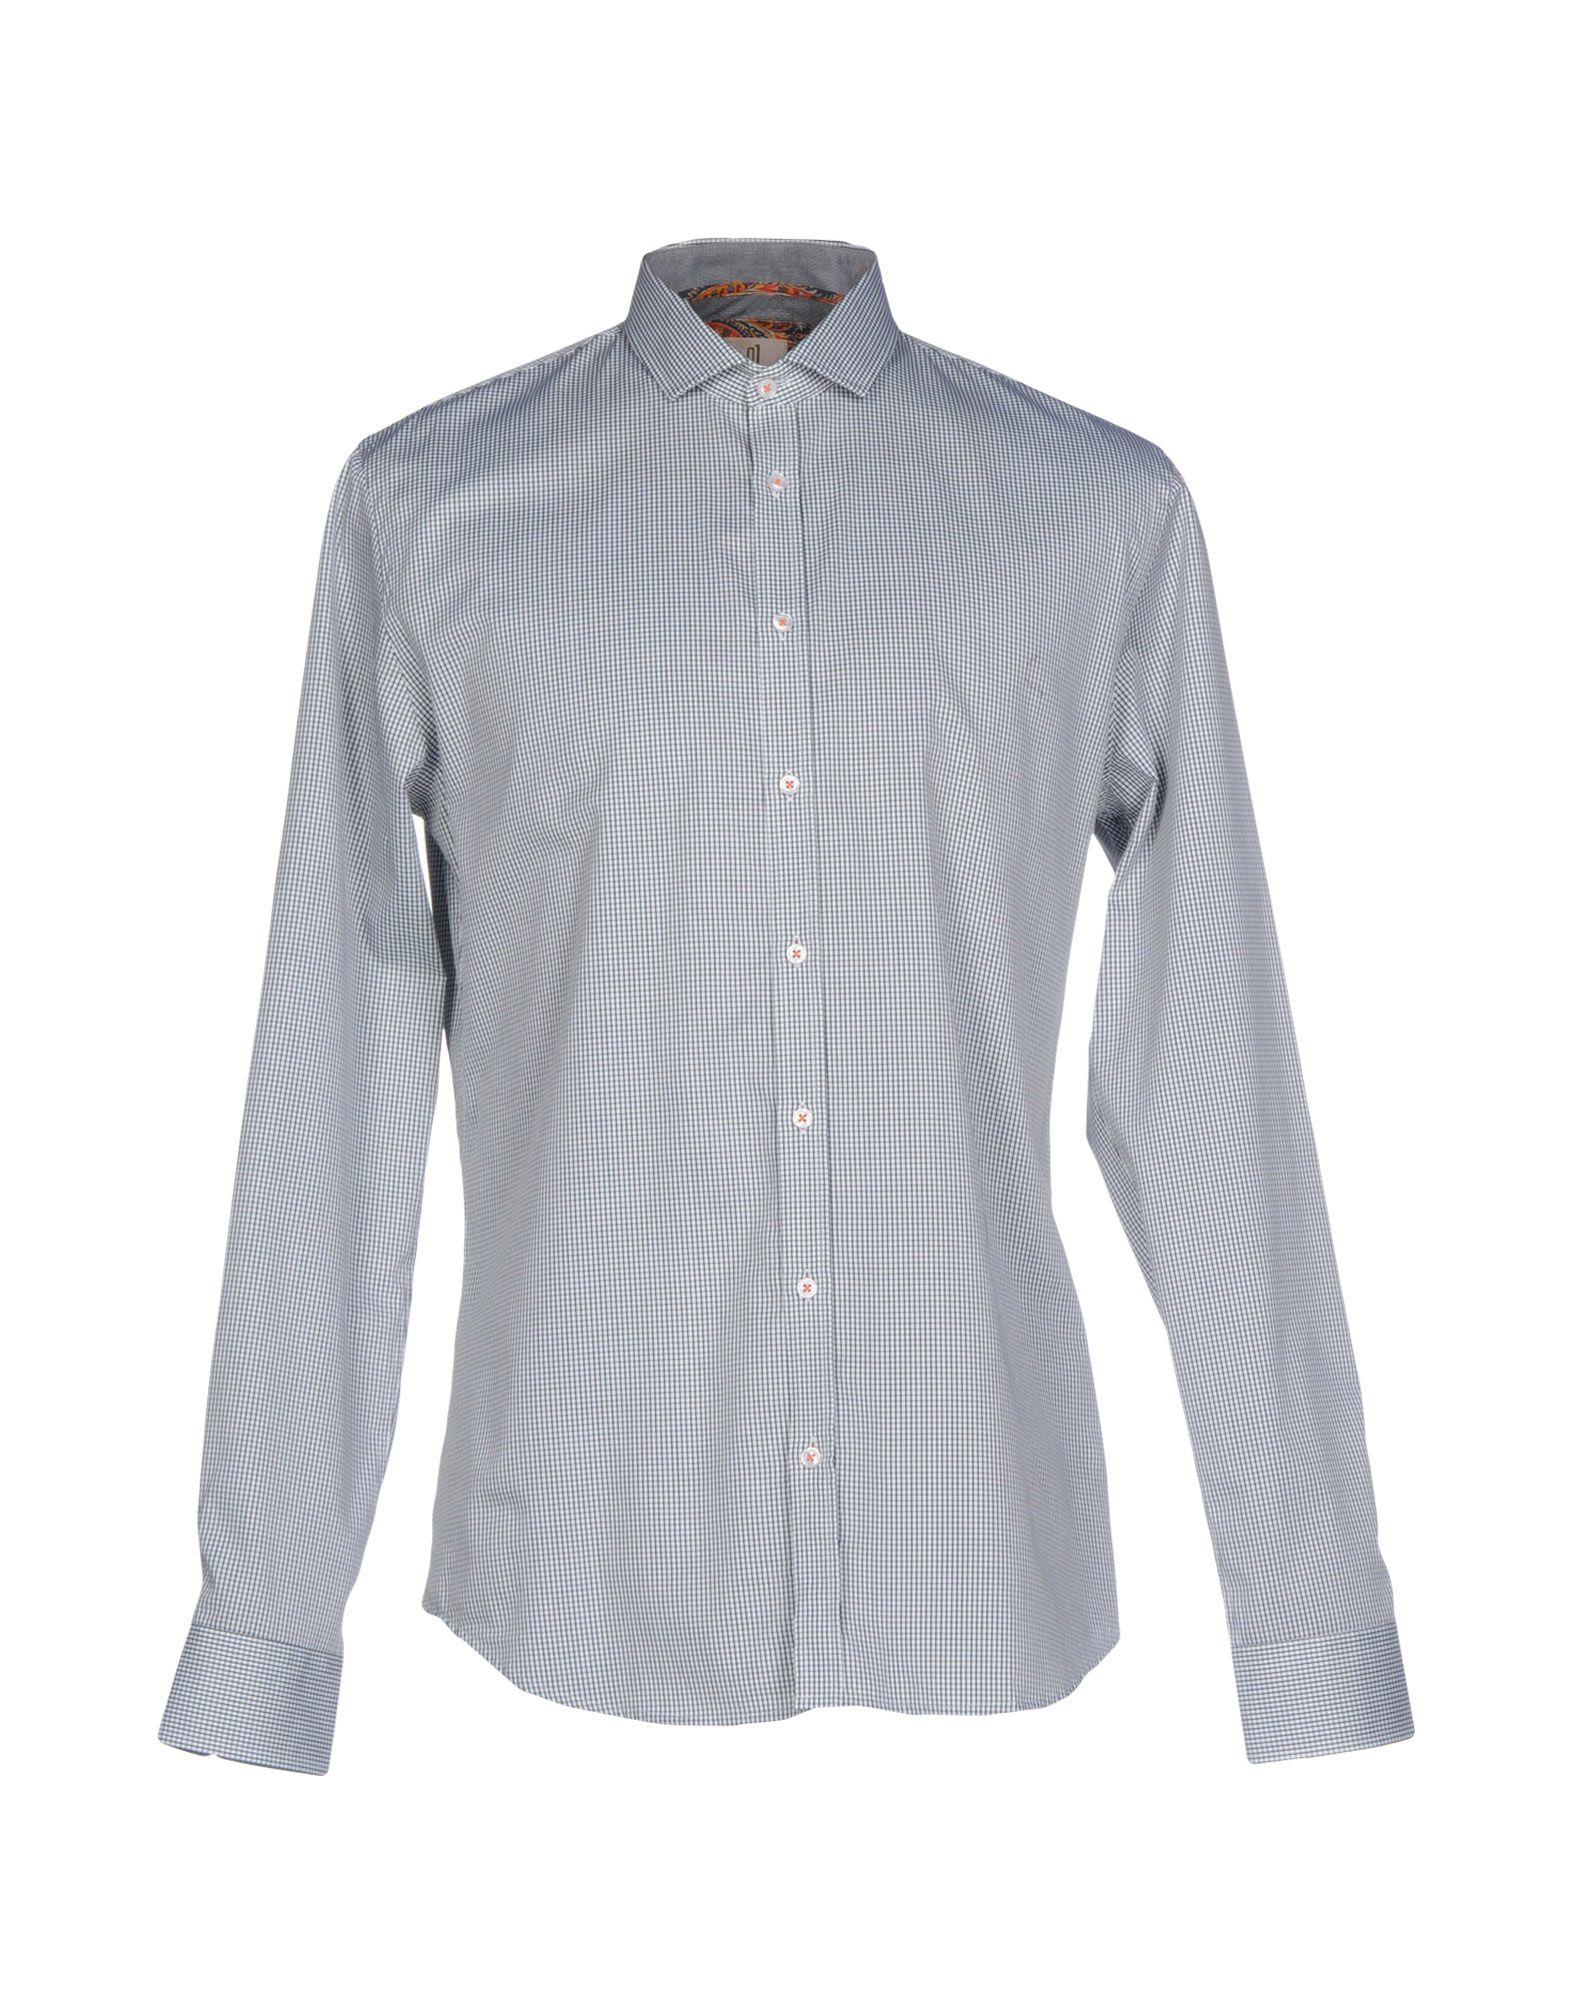 Q1 Pубашка laxc021t1b q1